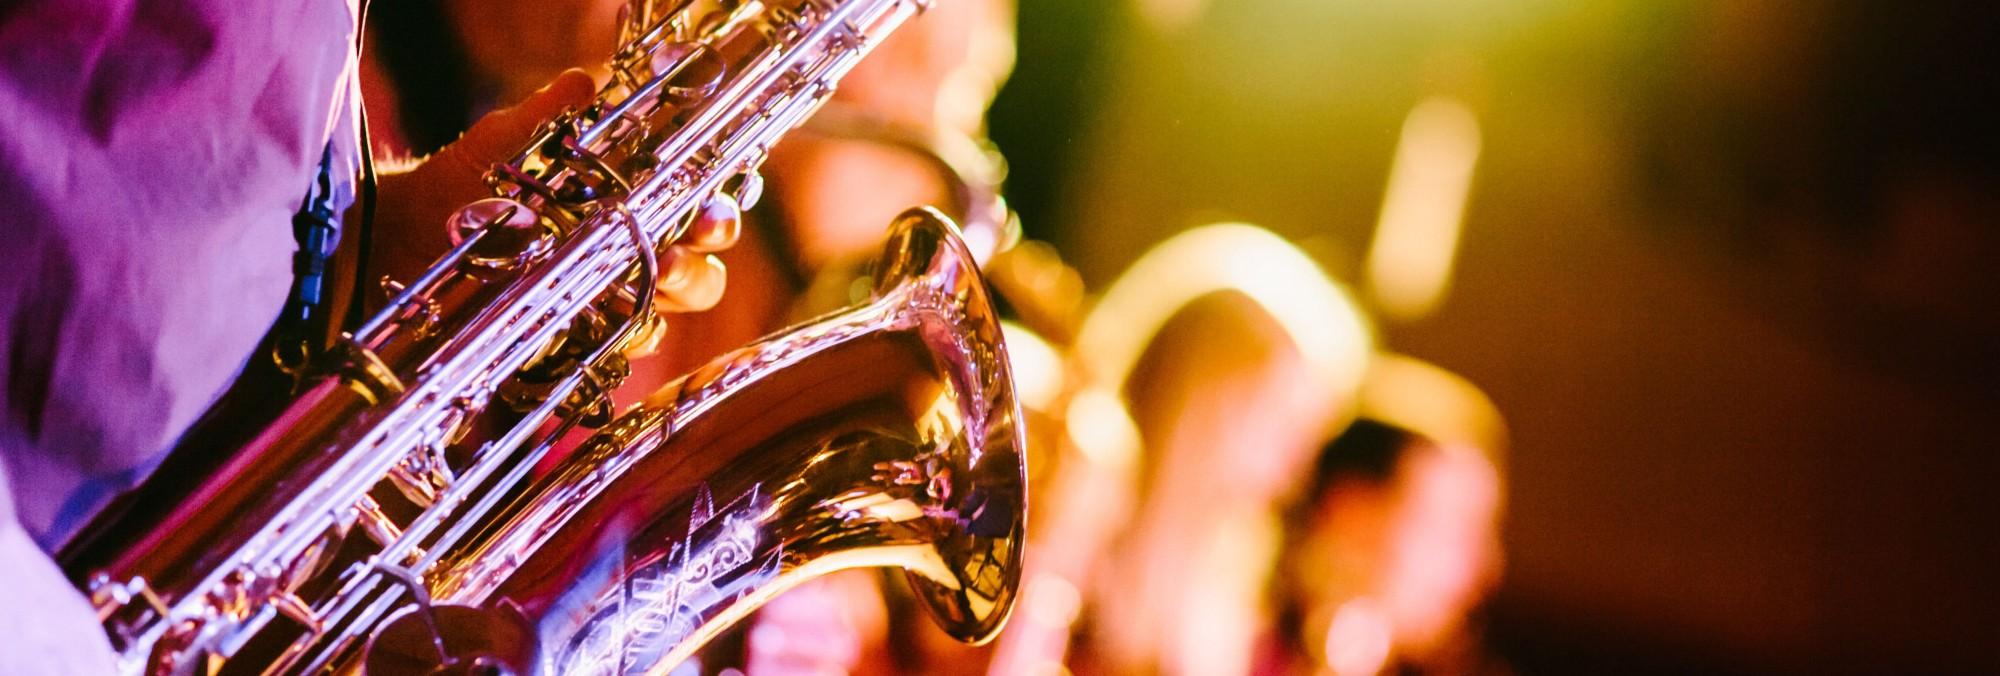 sassofono musicisti udito acufene